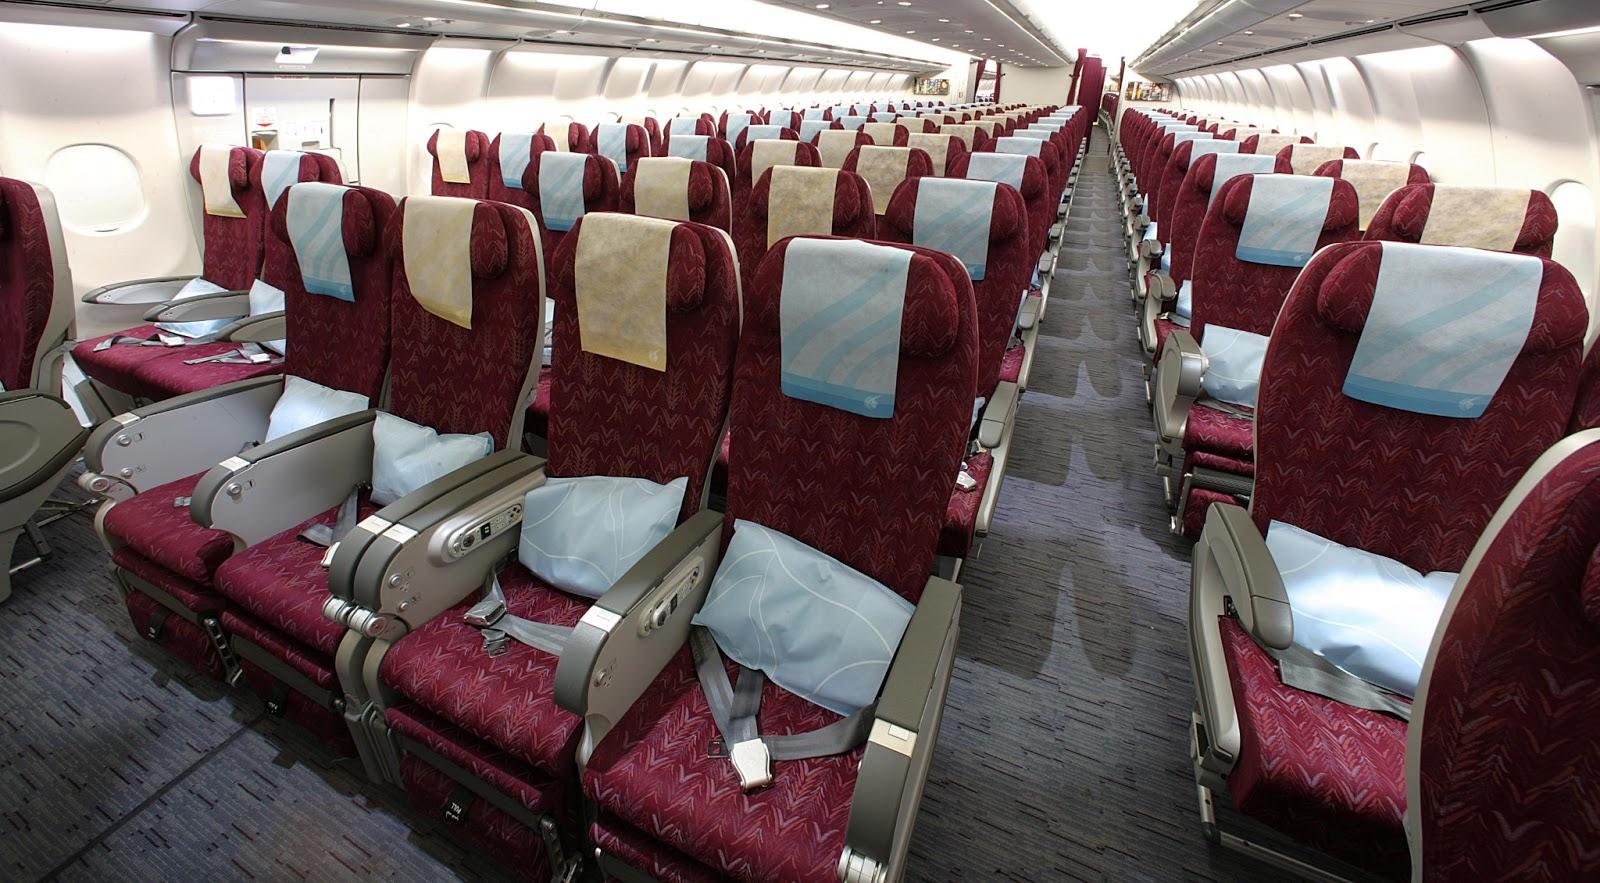 http://4.bp.blogspot.com/-9YClcE3SRL4/UVK-NmTjnzI/AAAAAAAAPrc/q10Ig8fPfPA/s1600/a340-600_qatar_airways_economy_class.jpg